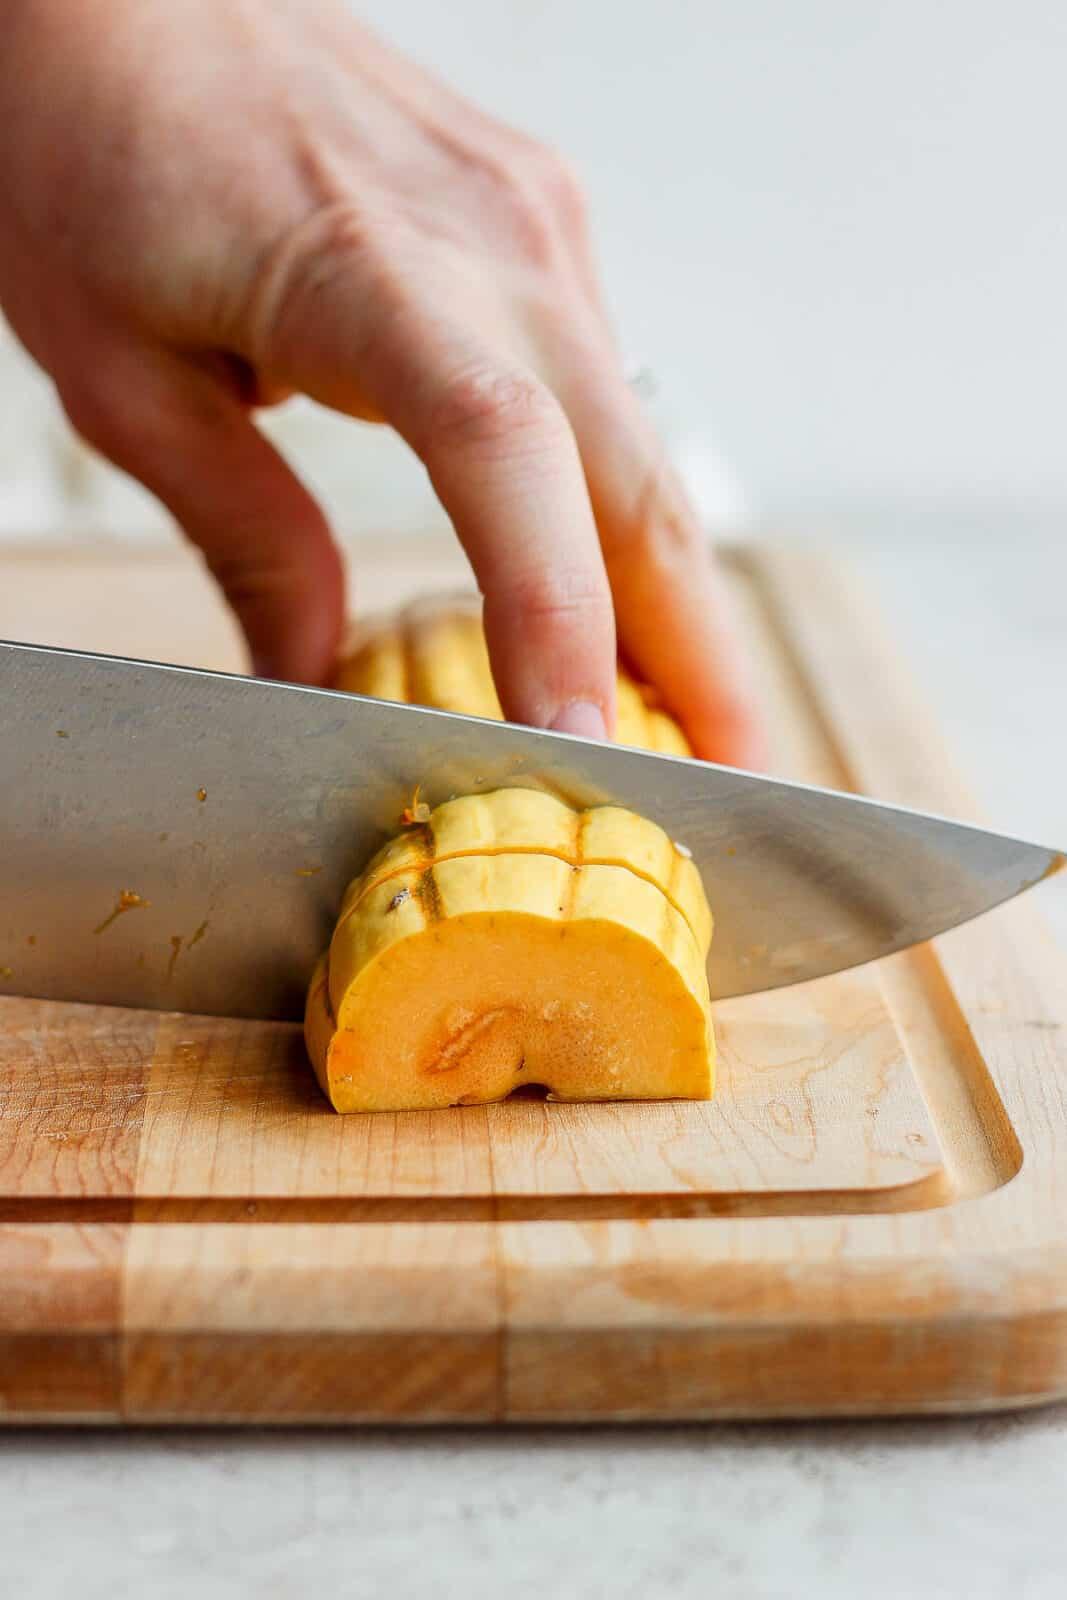 A delicata squash being cut into slices.